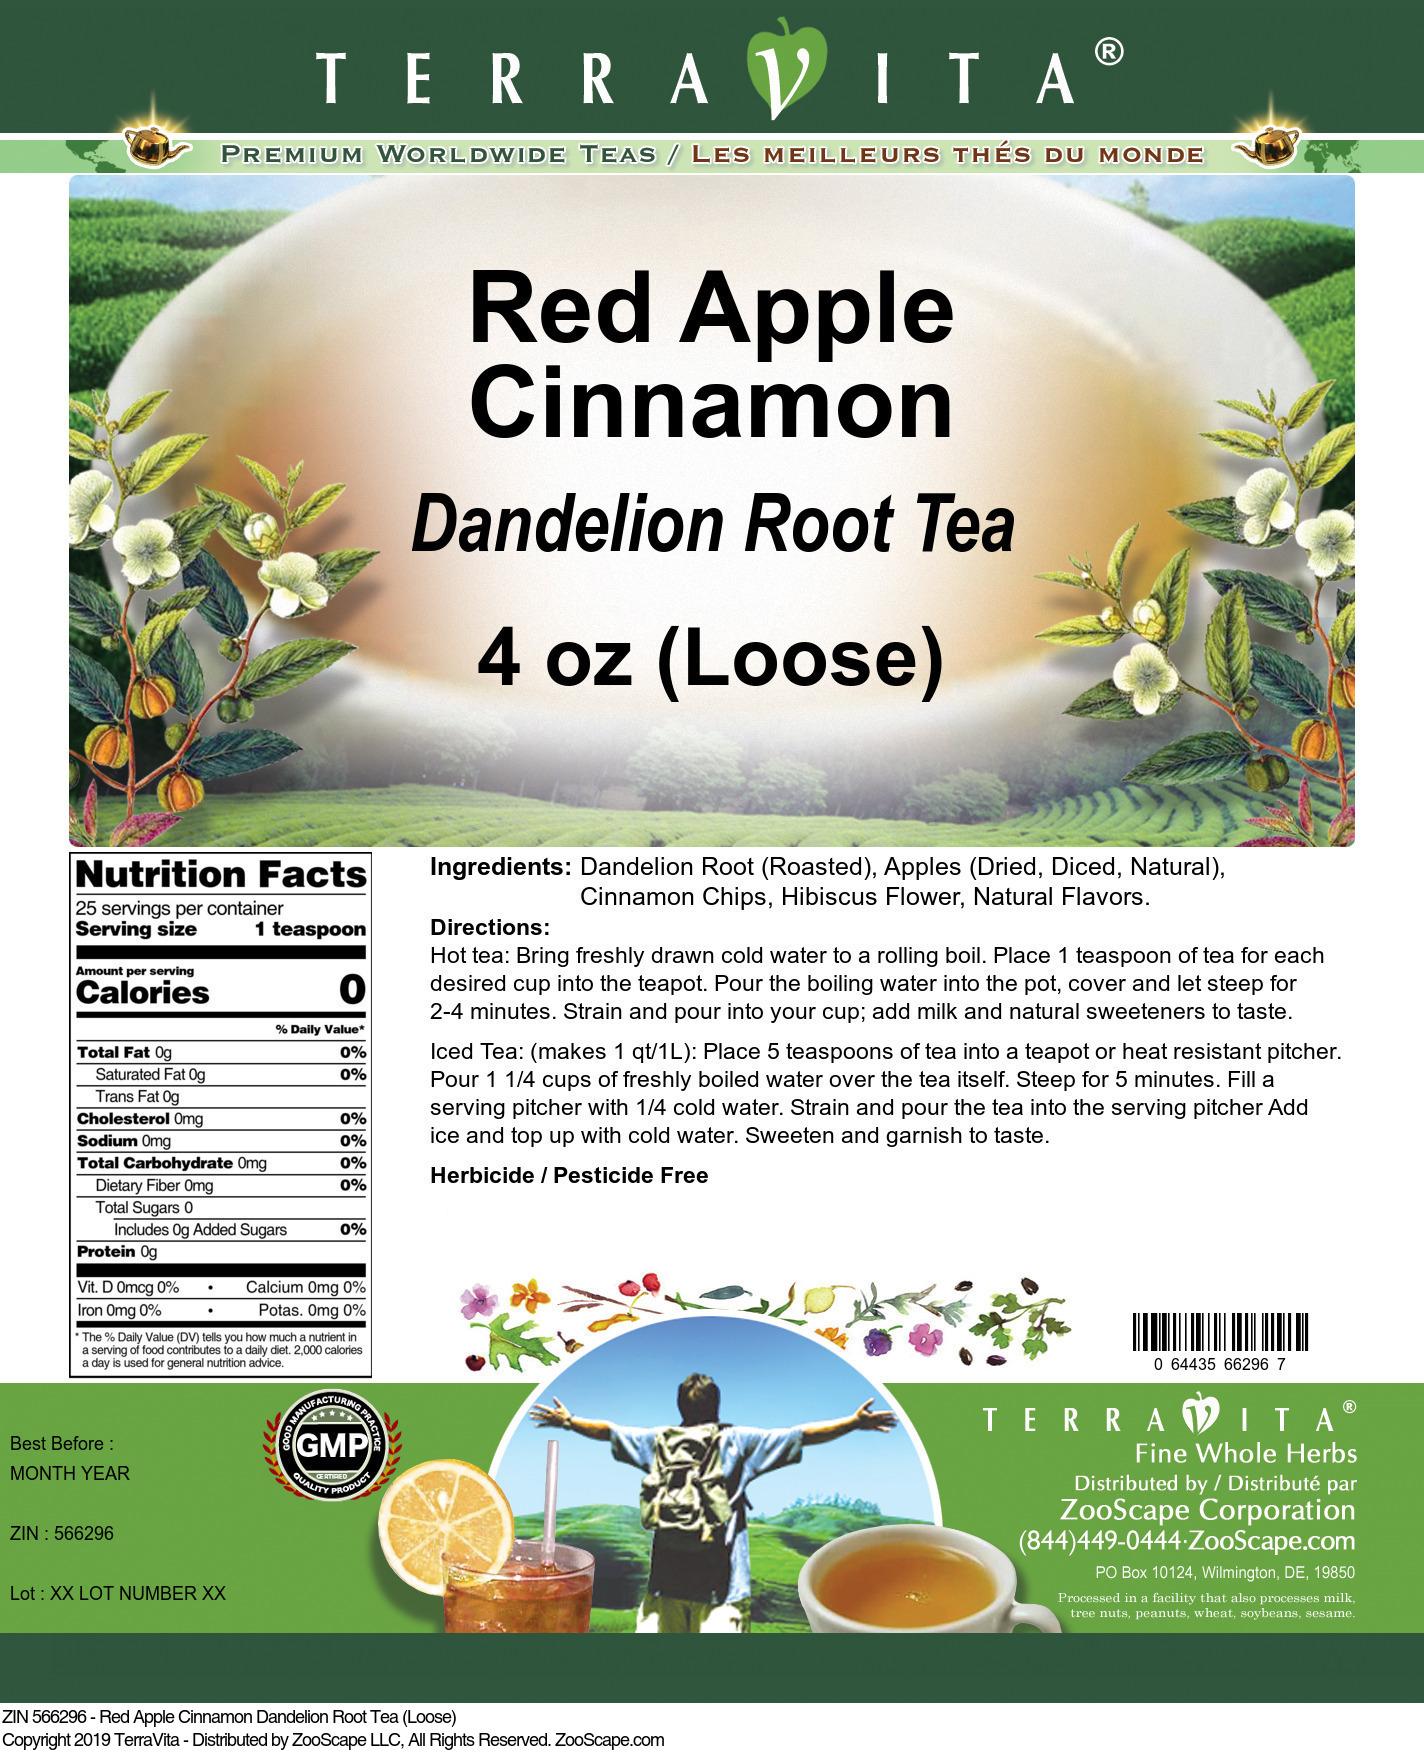 Red Apple Cinnamon Dandelion Root Tea (Loose)